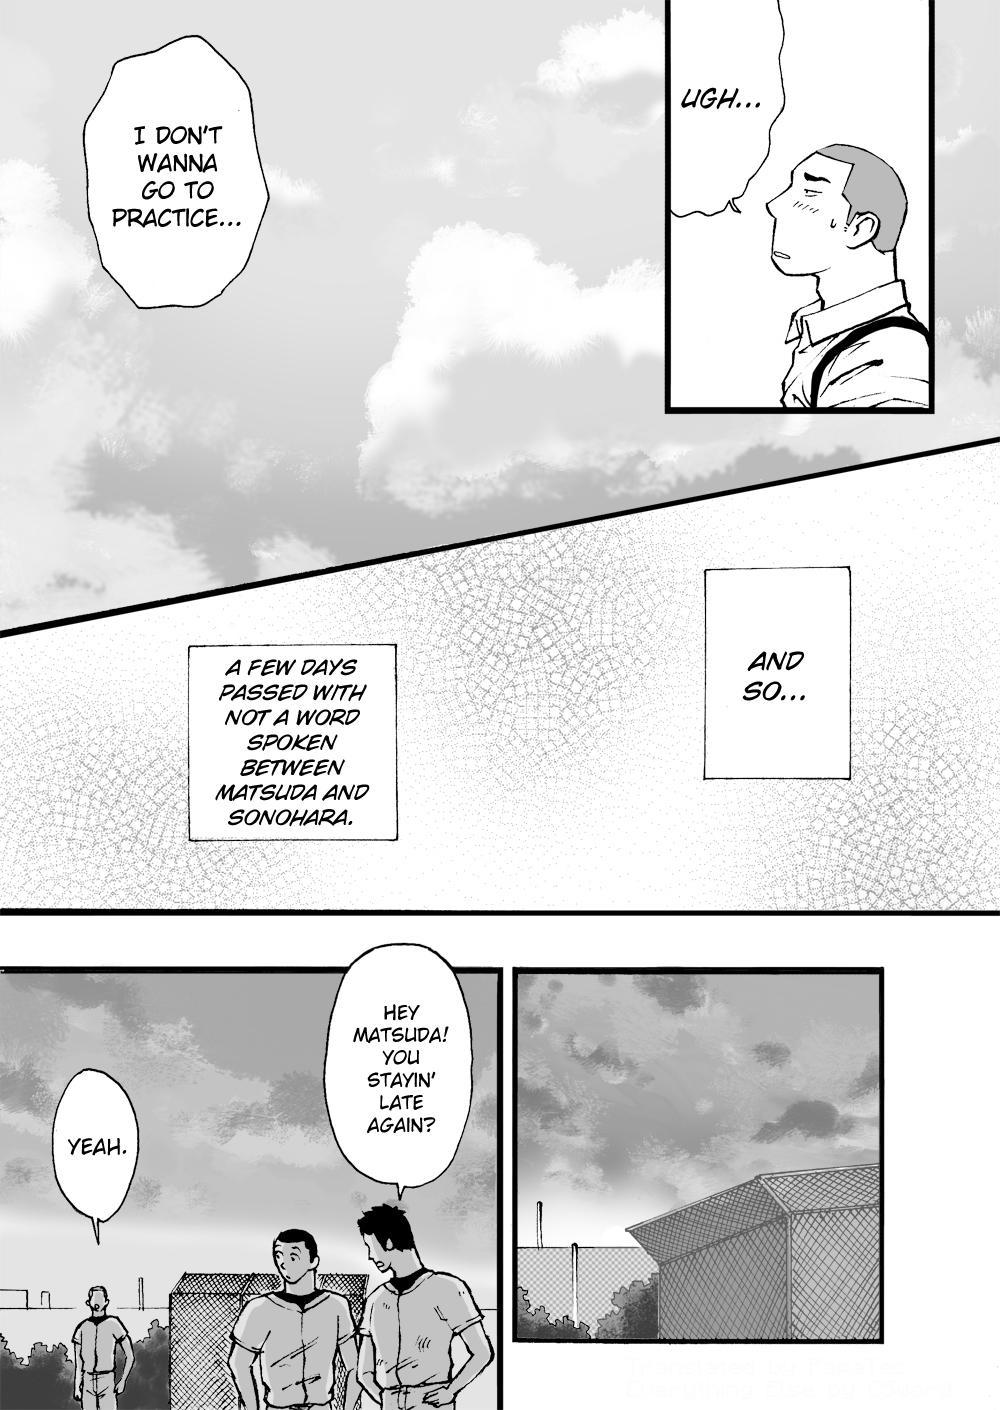 [Akahachi] Motemote Yakyuubu Otoko [Kouhen] | Popular Baseball Club Boys (Part Two) [English] [Papatez] 9